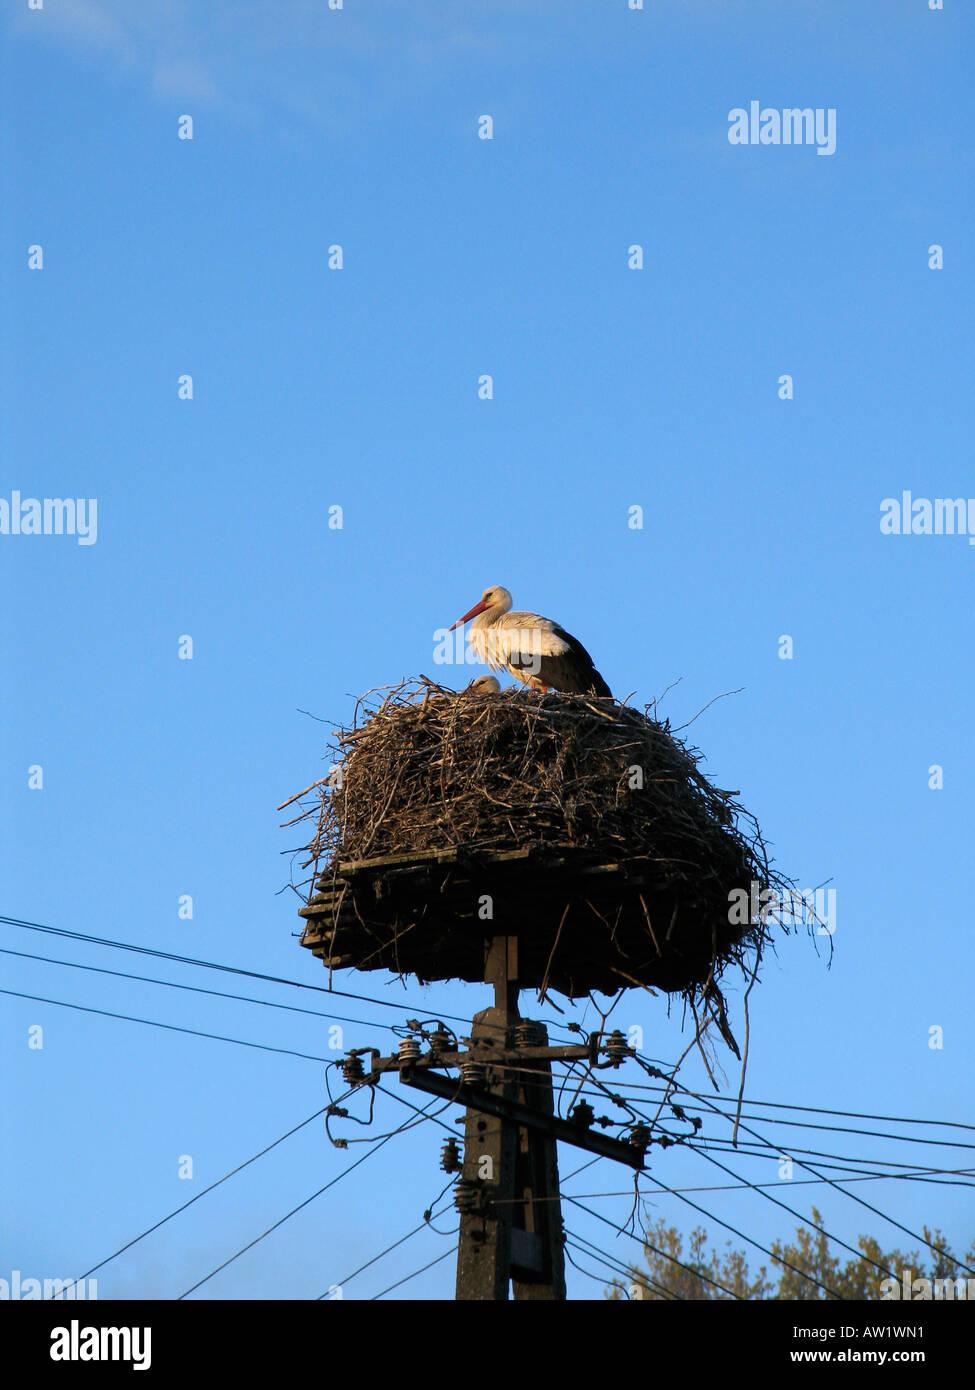 Stork's nest (Ciconiidae) on a telephone pole, Poland Stock Photo